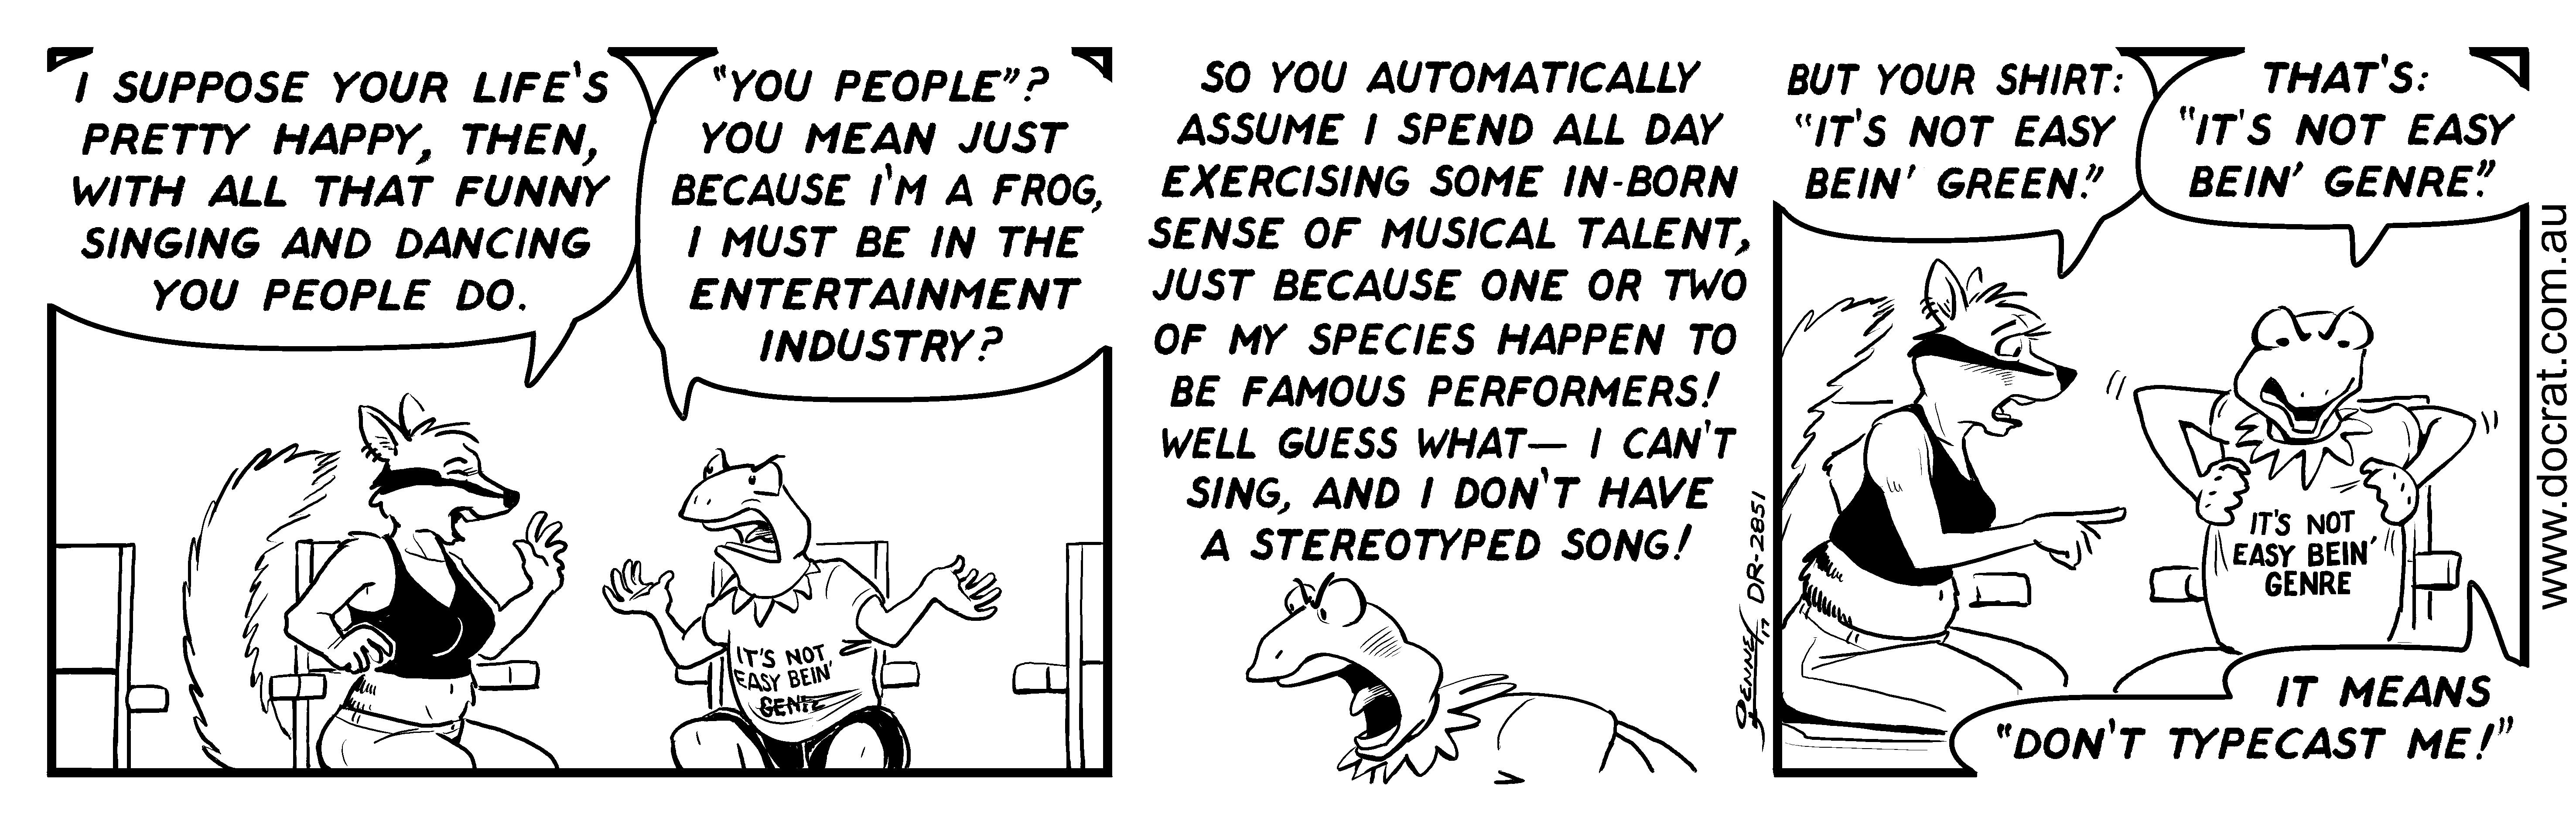 20170828